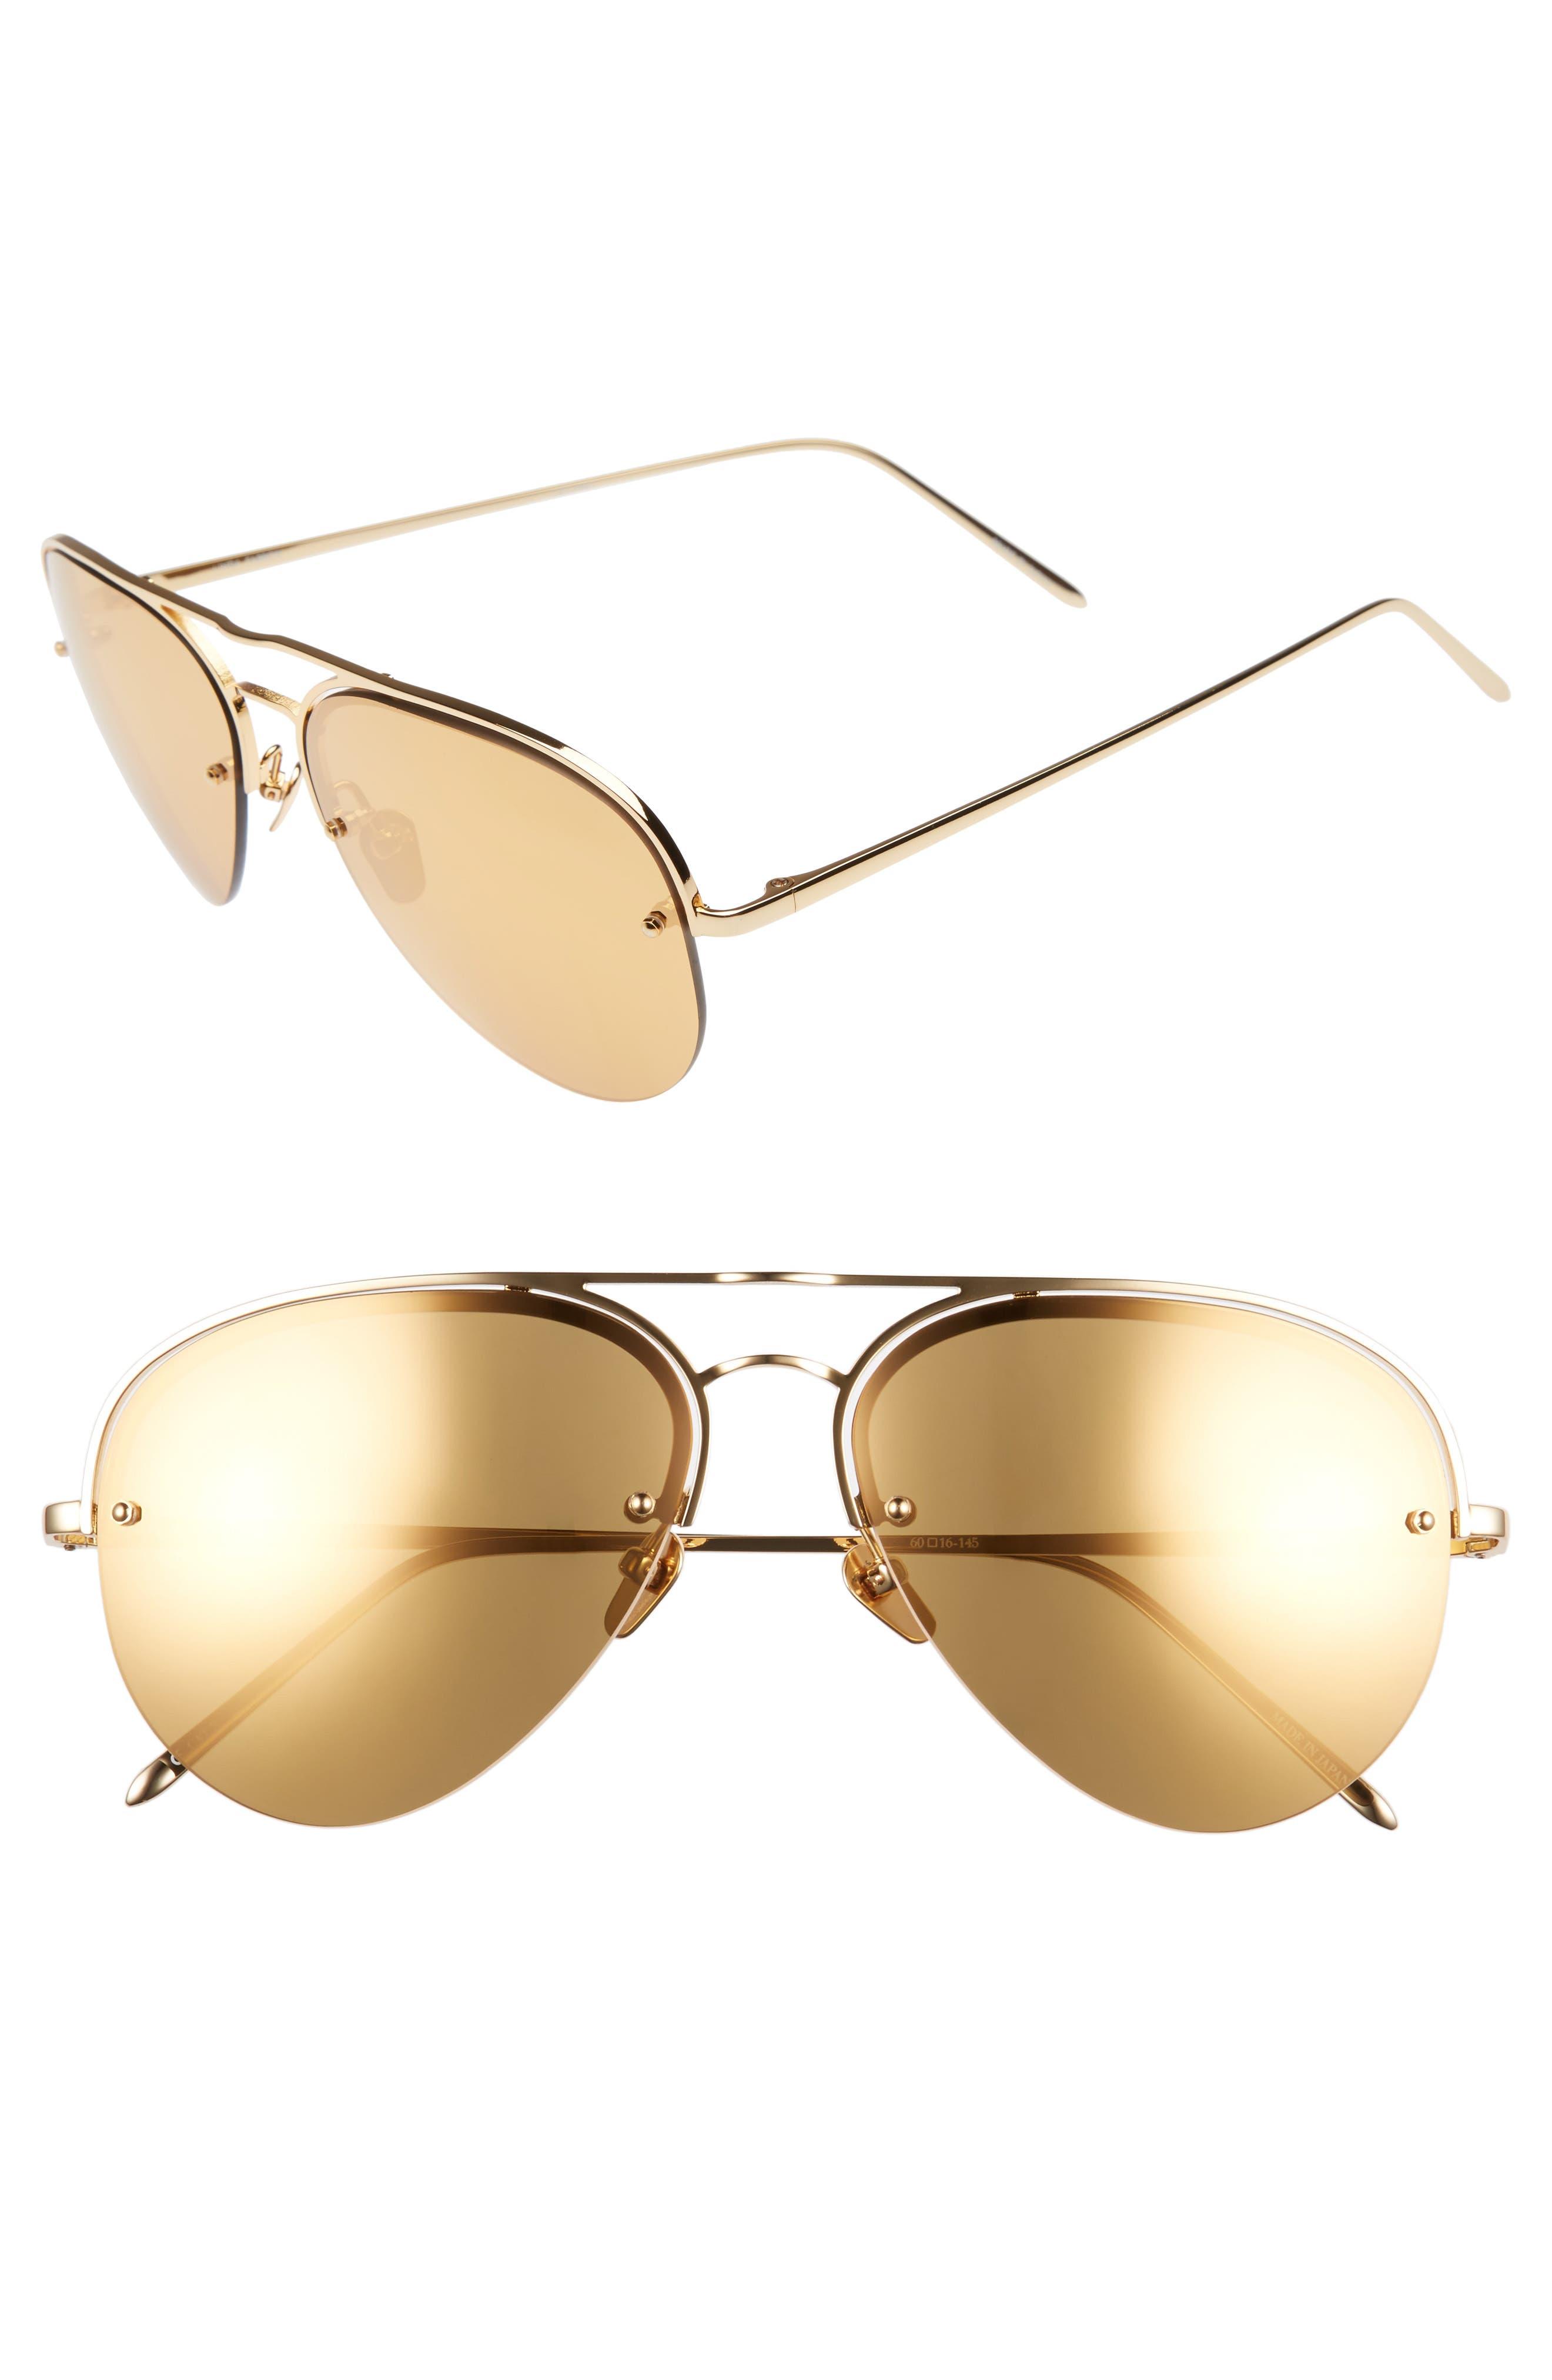 Alternate Image 1 Selected - Linda Farrow 60mm Mirrored 22 Karat Gold Aviator Sunglasses